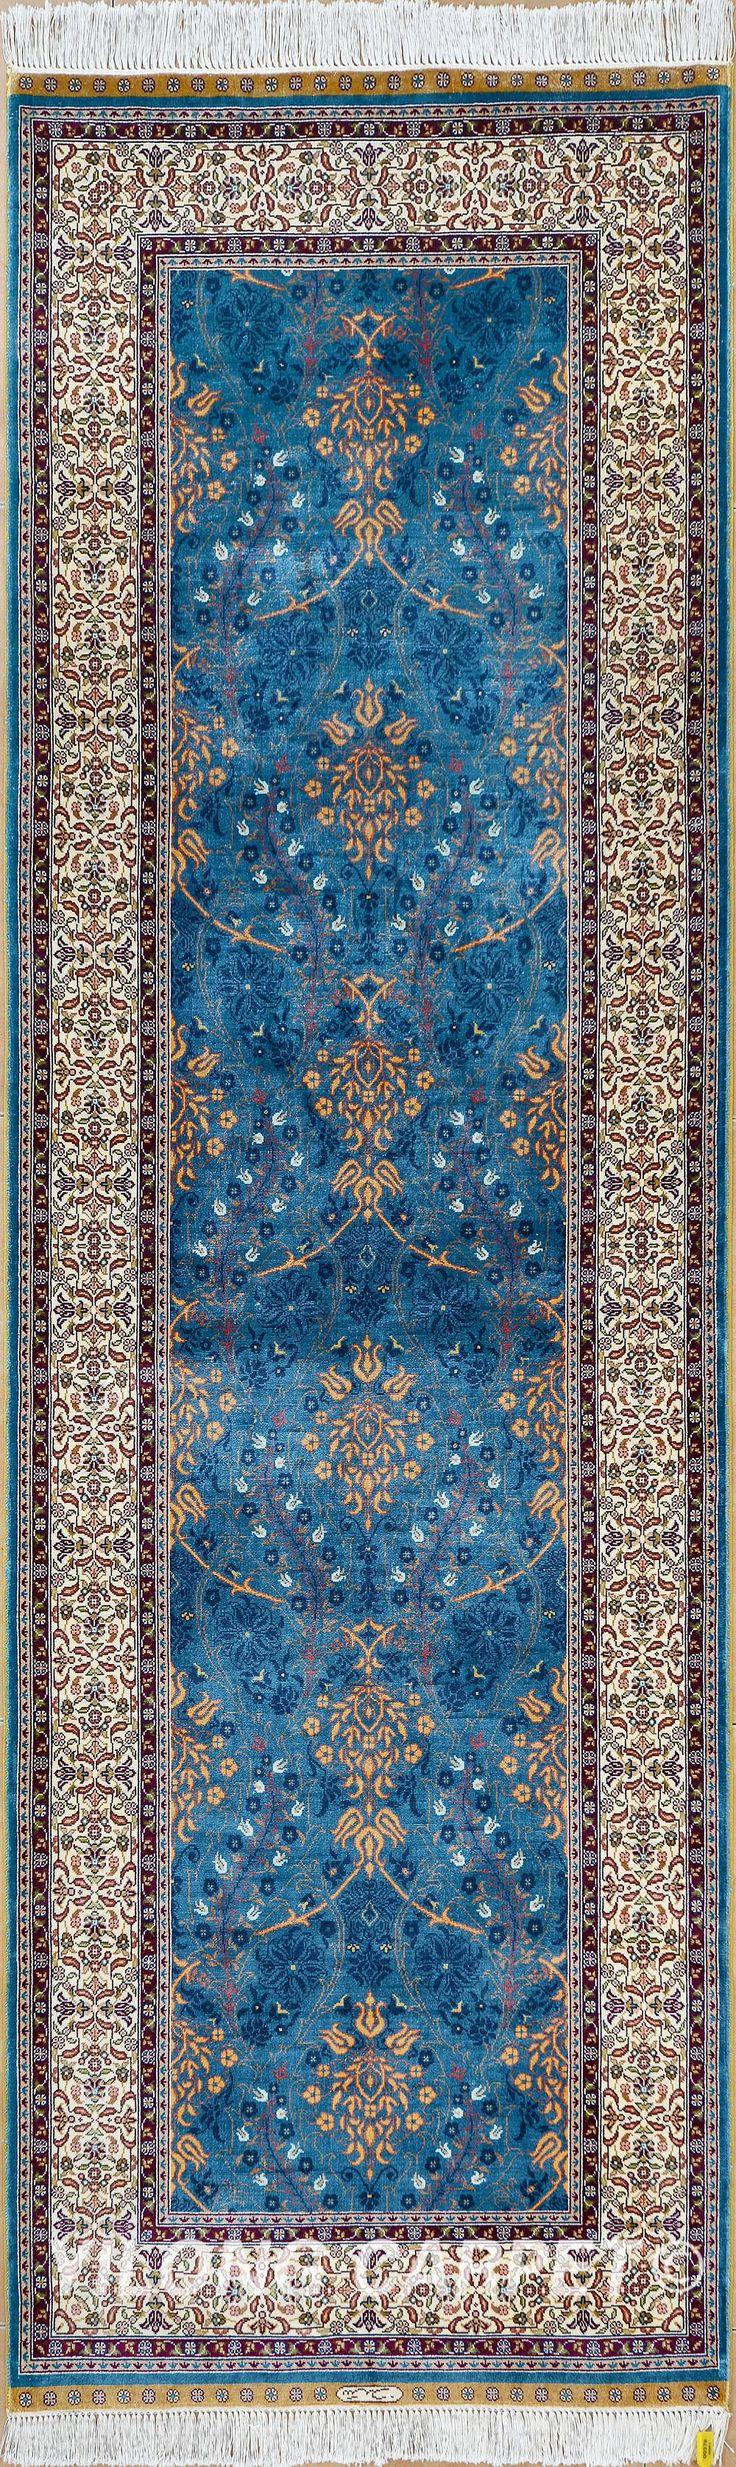 Blue Rug Runner Persian Rug Oriental Turkish Carpet Hand